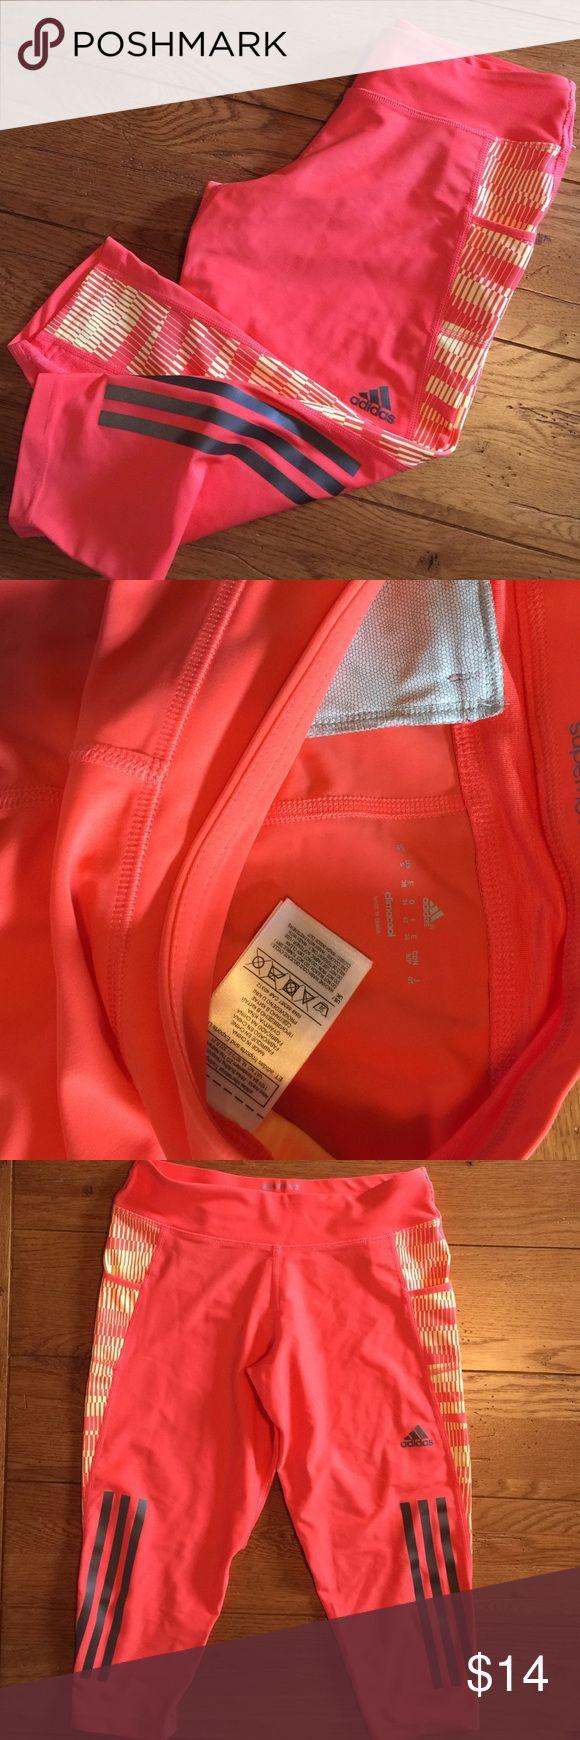 🍁ADIDAS Climacool Capri Leggings🍁 🍁Adidas..Climacool-SuperNova Capri Leggings..Orange and Yellow accents ..Zip pocket on back of band..Size Small..Like NEW condition 🍁 Adidas Pants Leggings